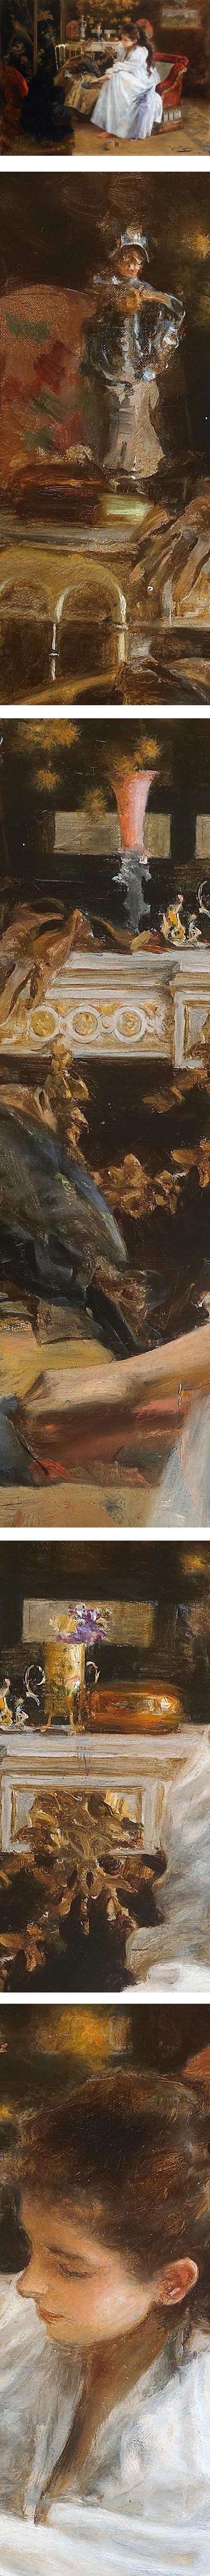 De soiree, Roma Ribera